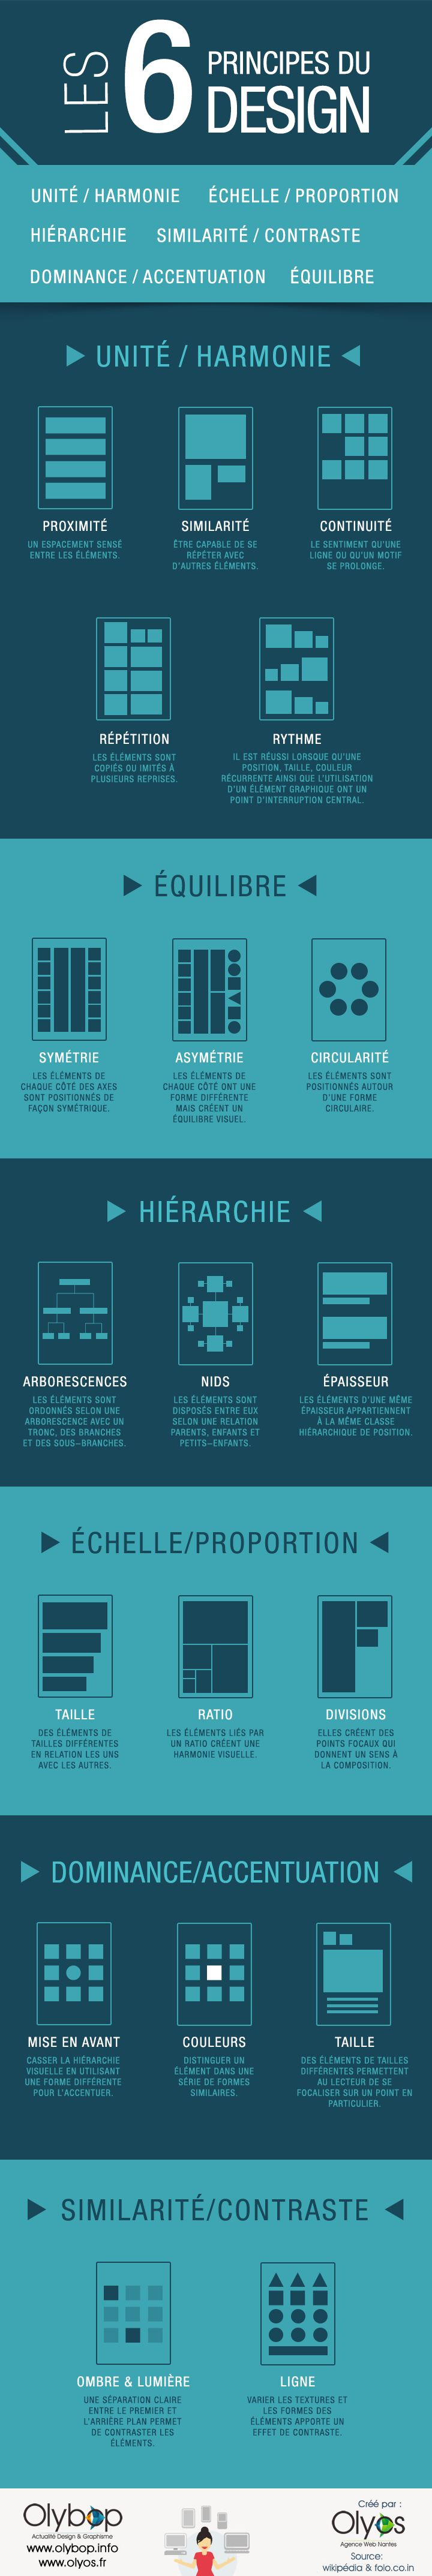 infographie-les-6-principes-du-design  http://www.justleds.co.za